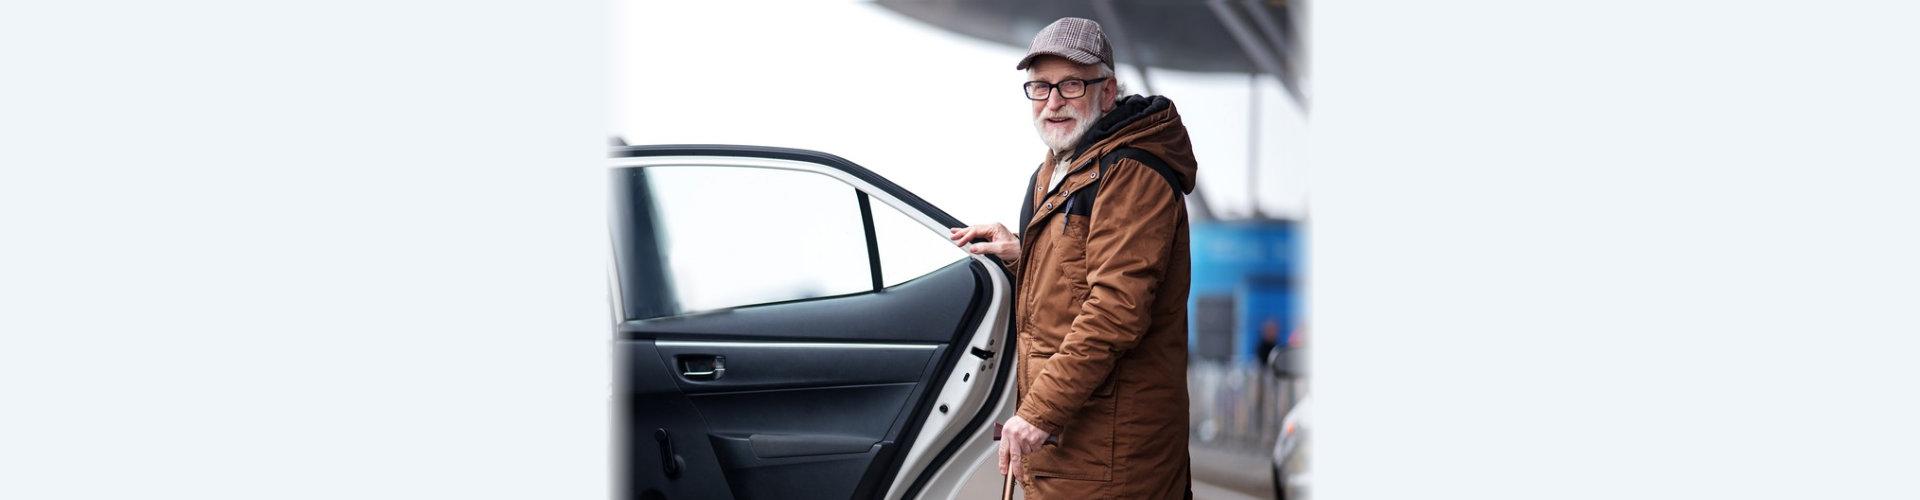 elder man entering a private car concept